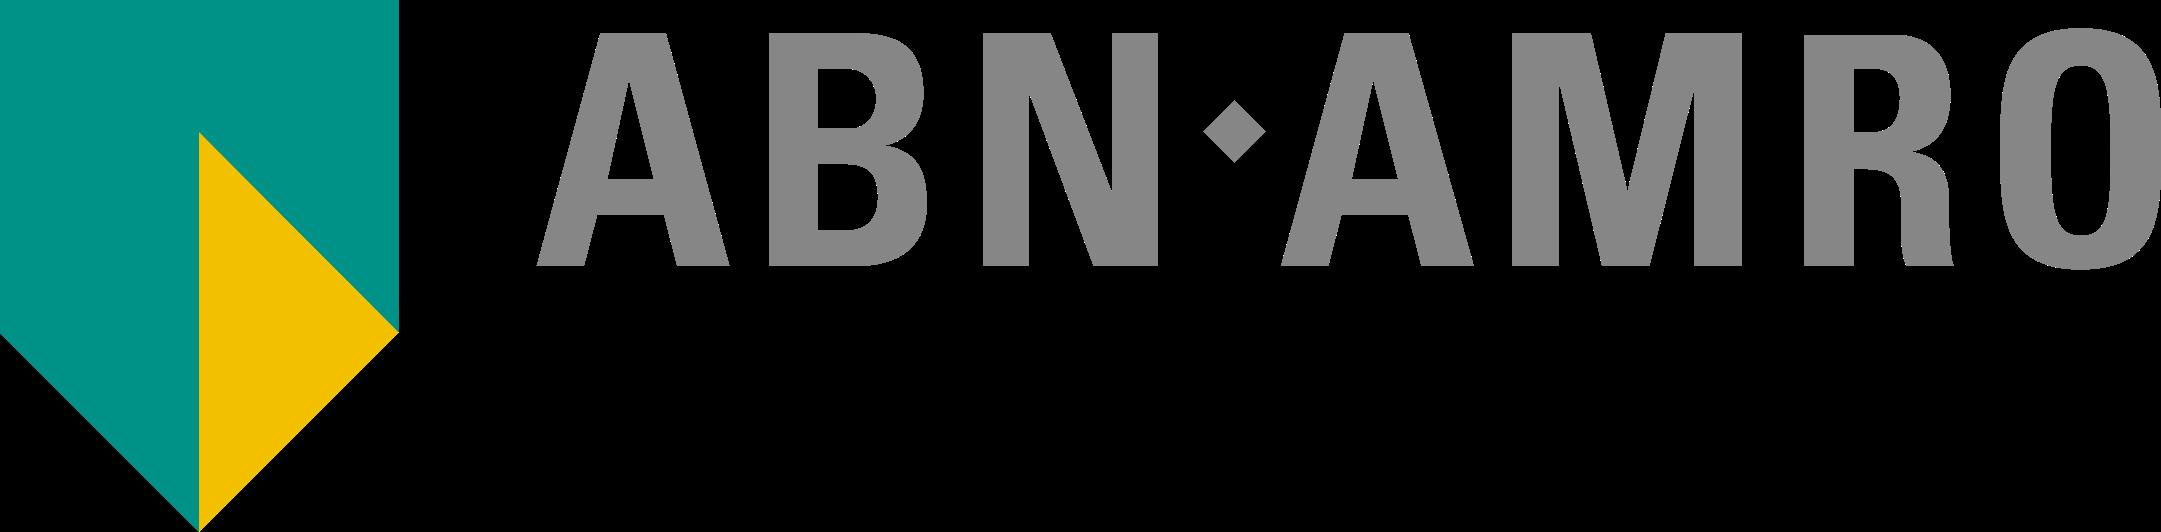 abn amro logo 1 - ABN AMRO Logo